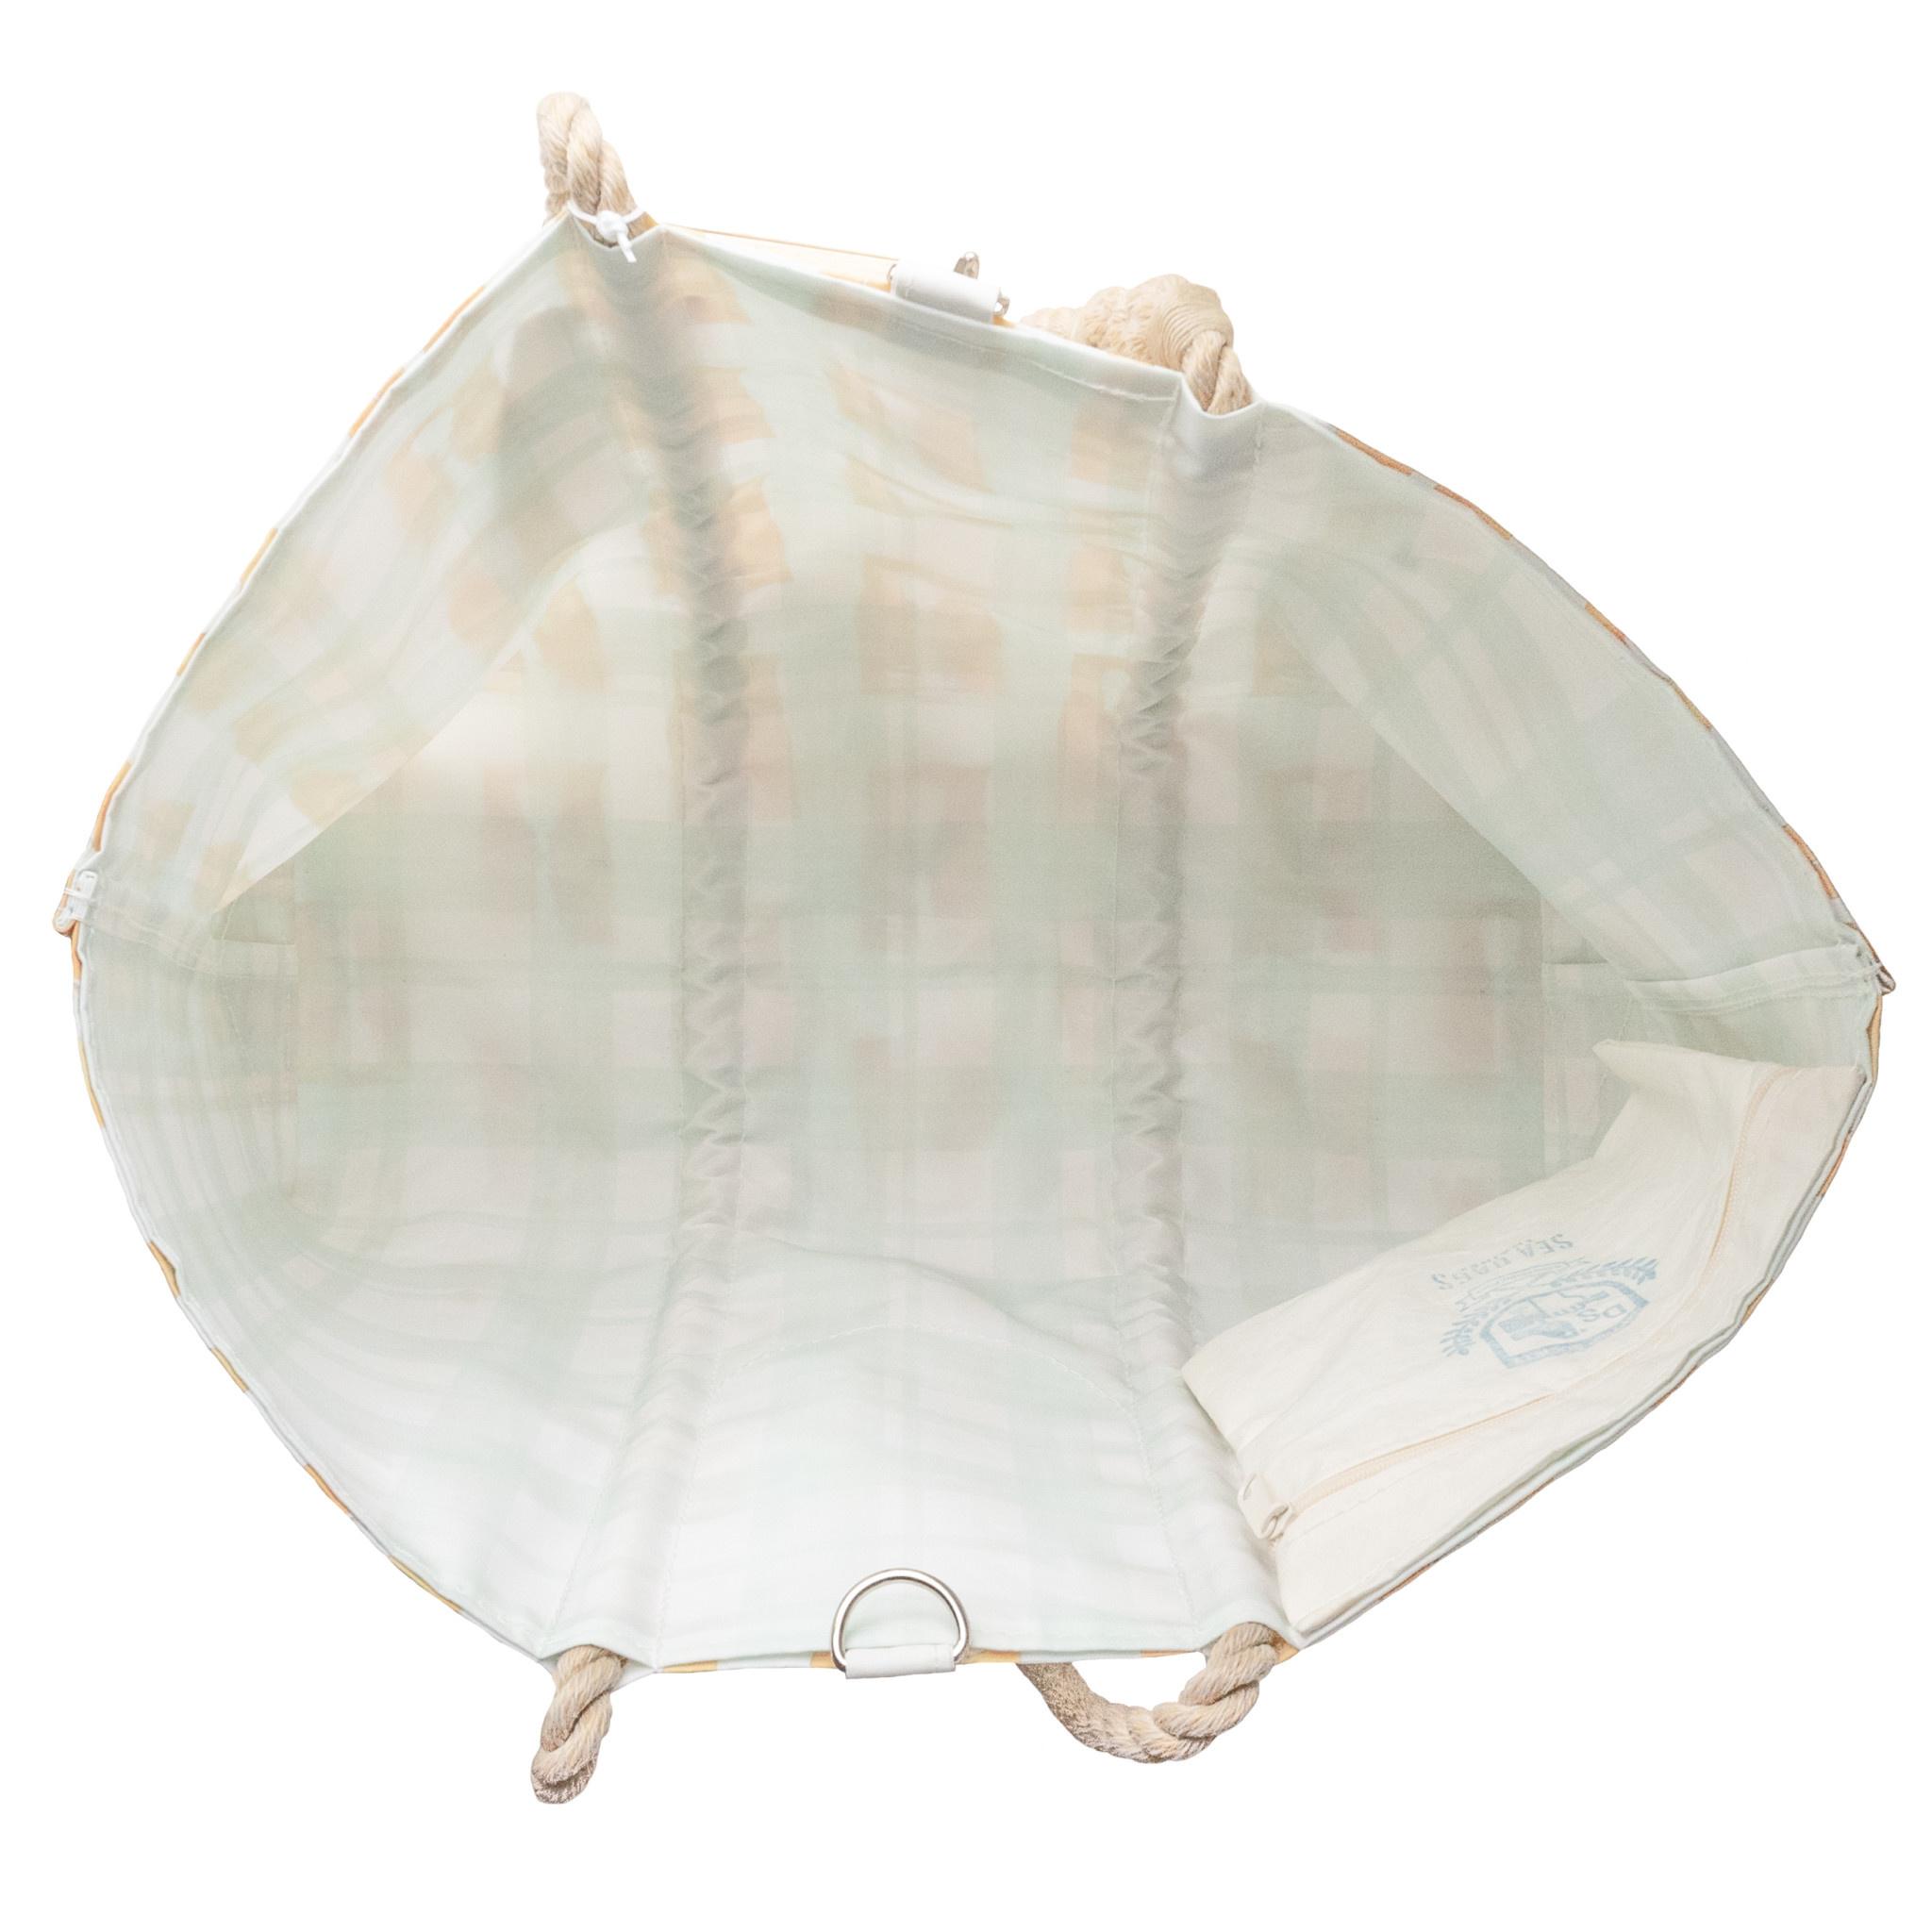 Sea Bags Sara Fitz - Life Jacket - Large Tote - Hemp Handle with Clasp